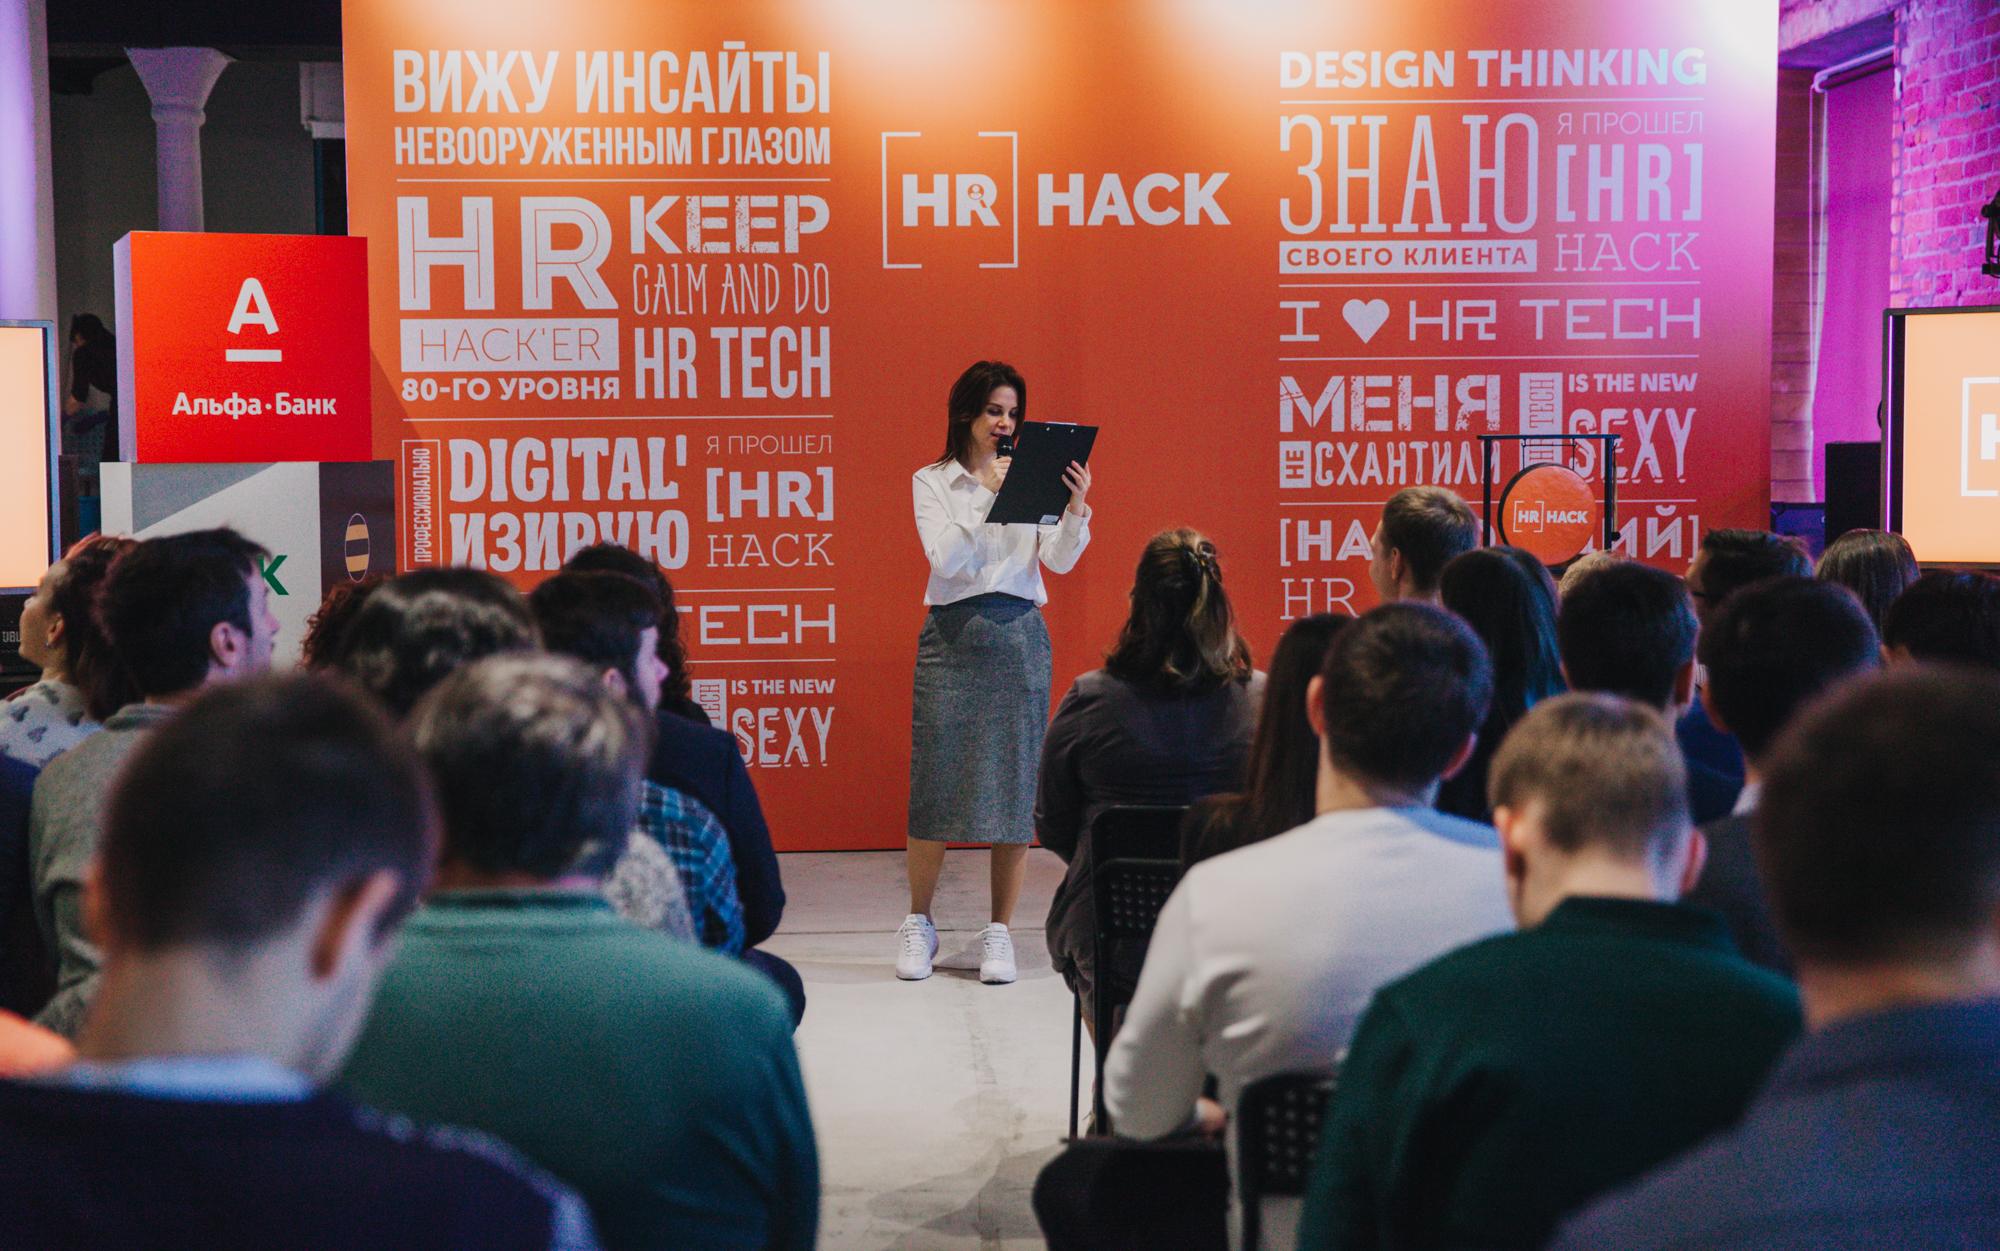 Итоги хакатона HR-hack